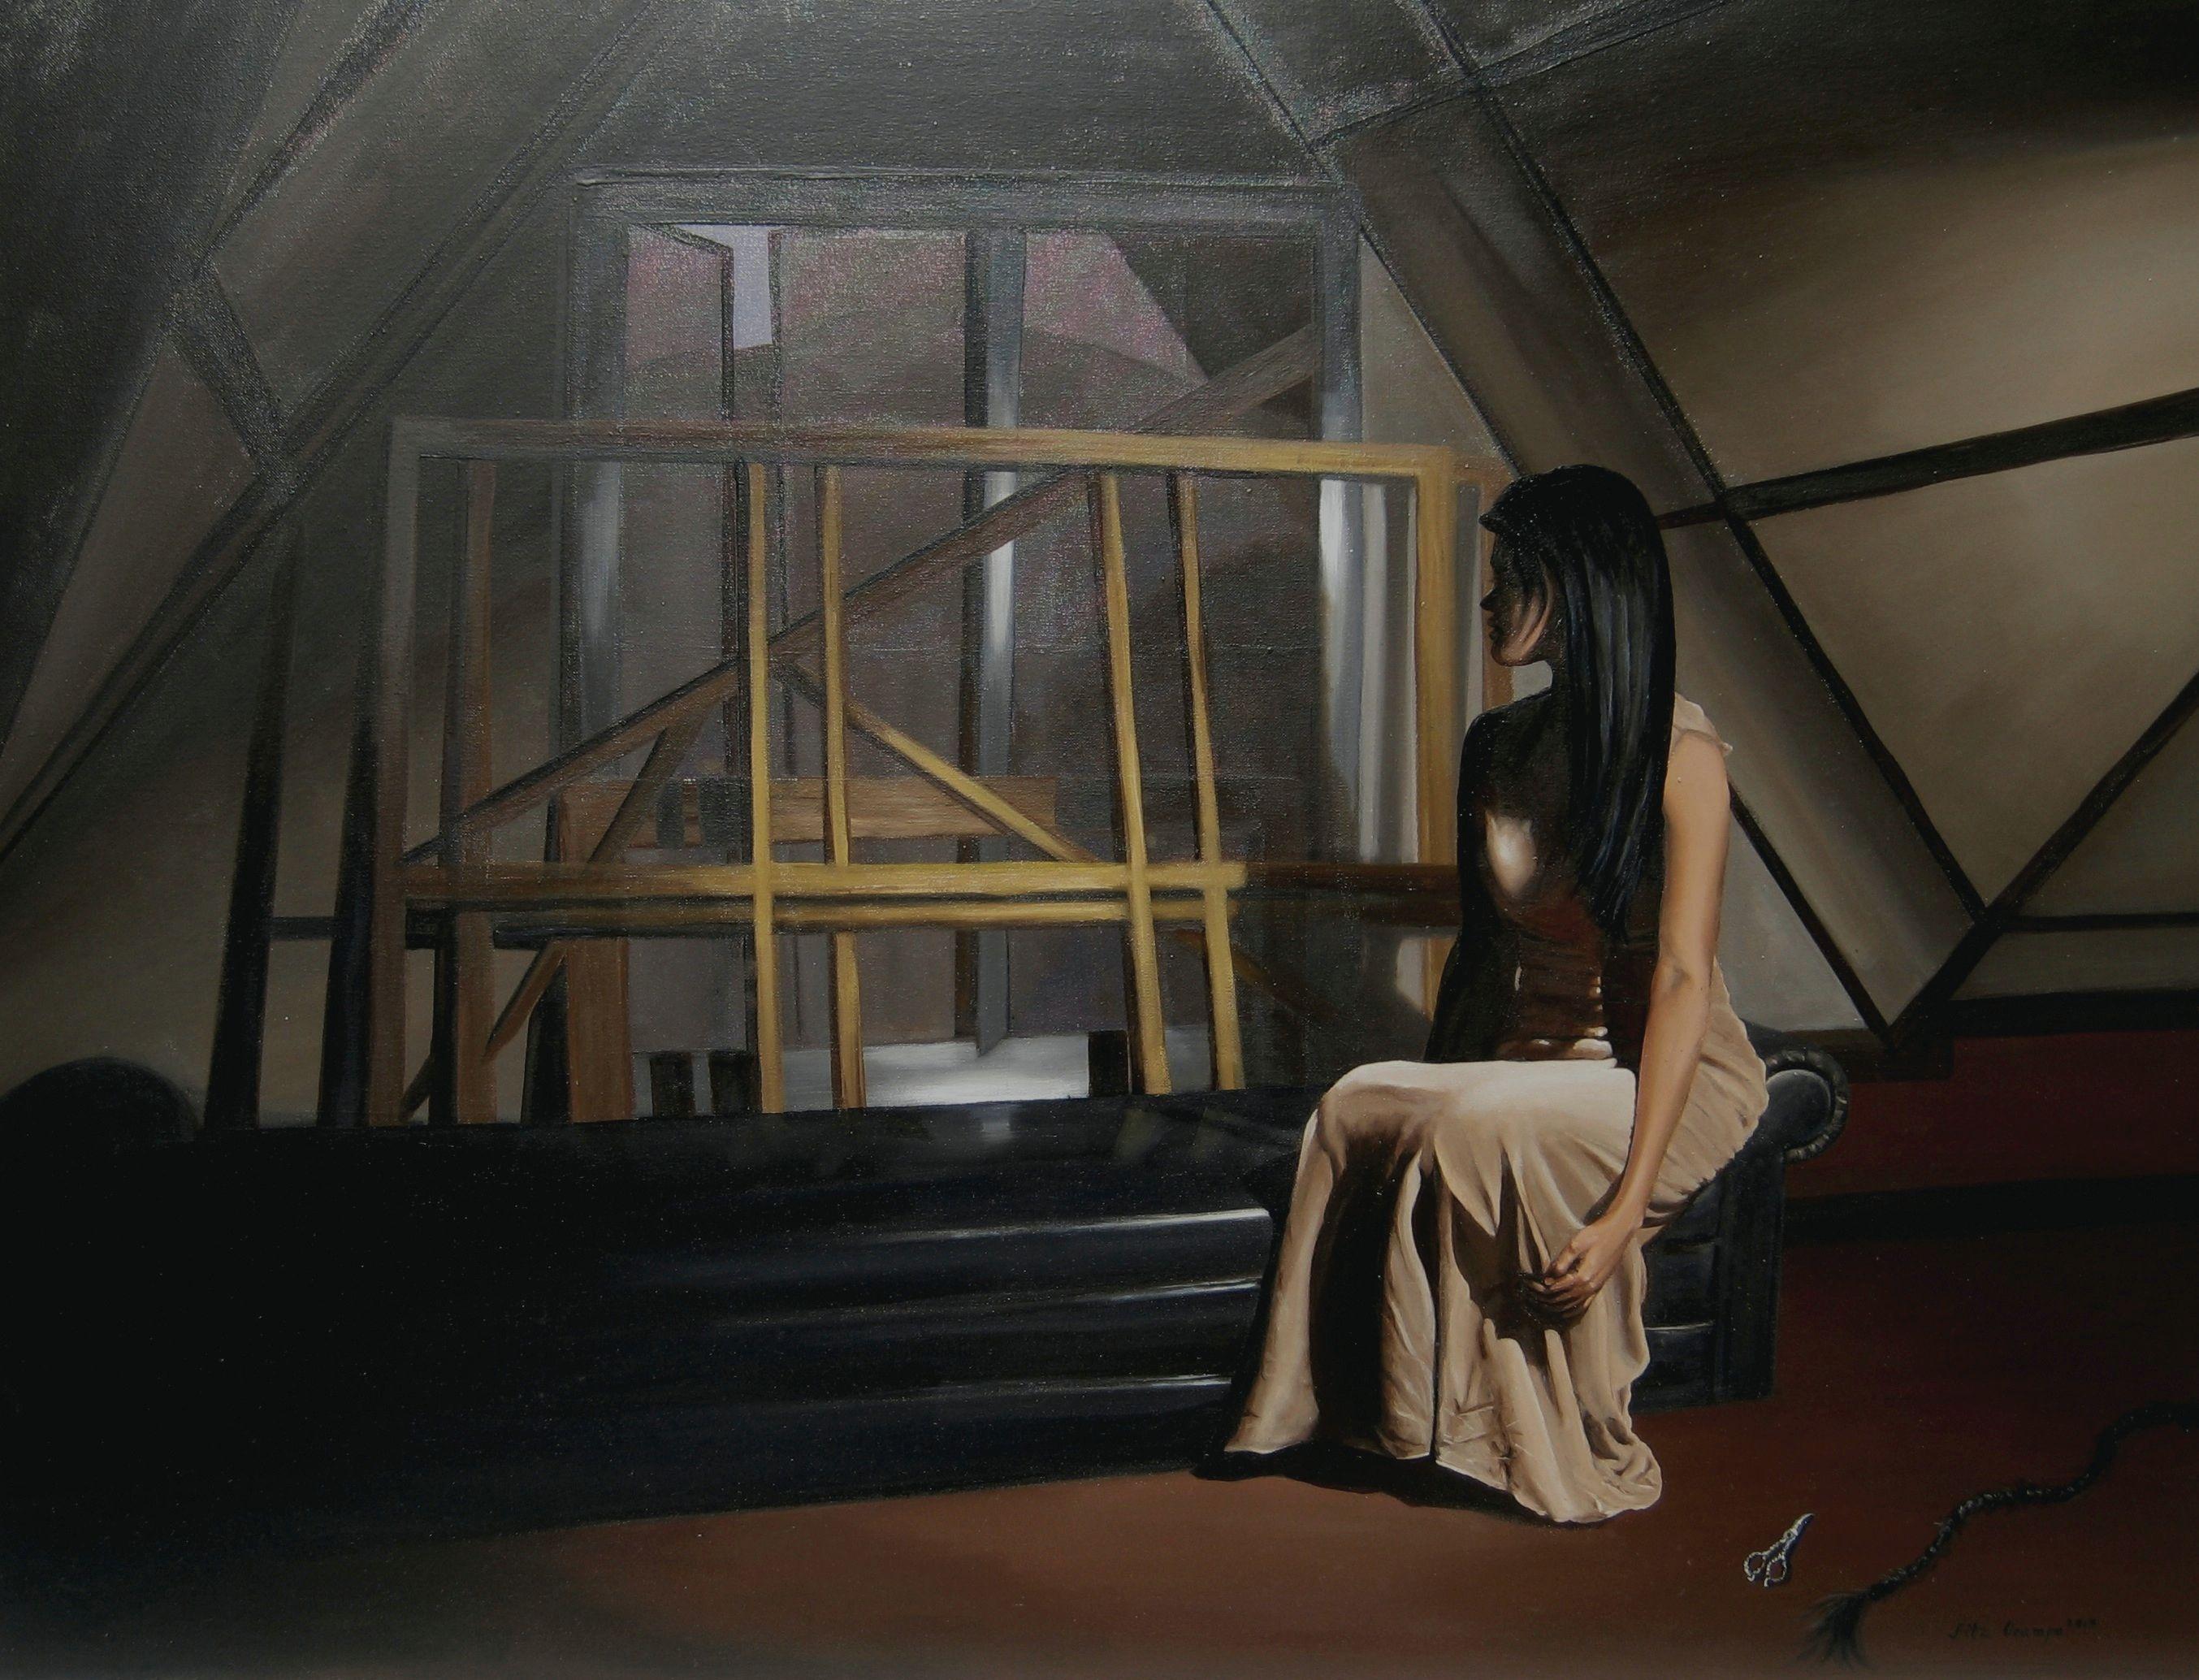 Ocampo Fitz Prisoner of Fear 2013 Painting 36x48inches  #OpenArt #Milano #arte #Milan #concorso #artcontest #associazione   www.concorsobuenosaires.com